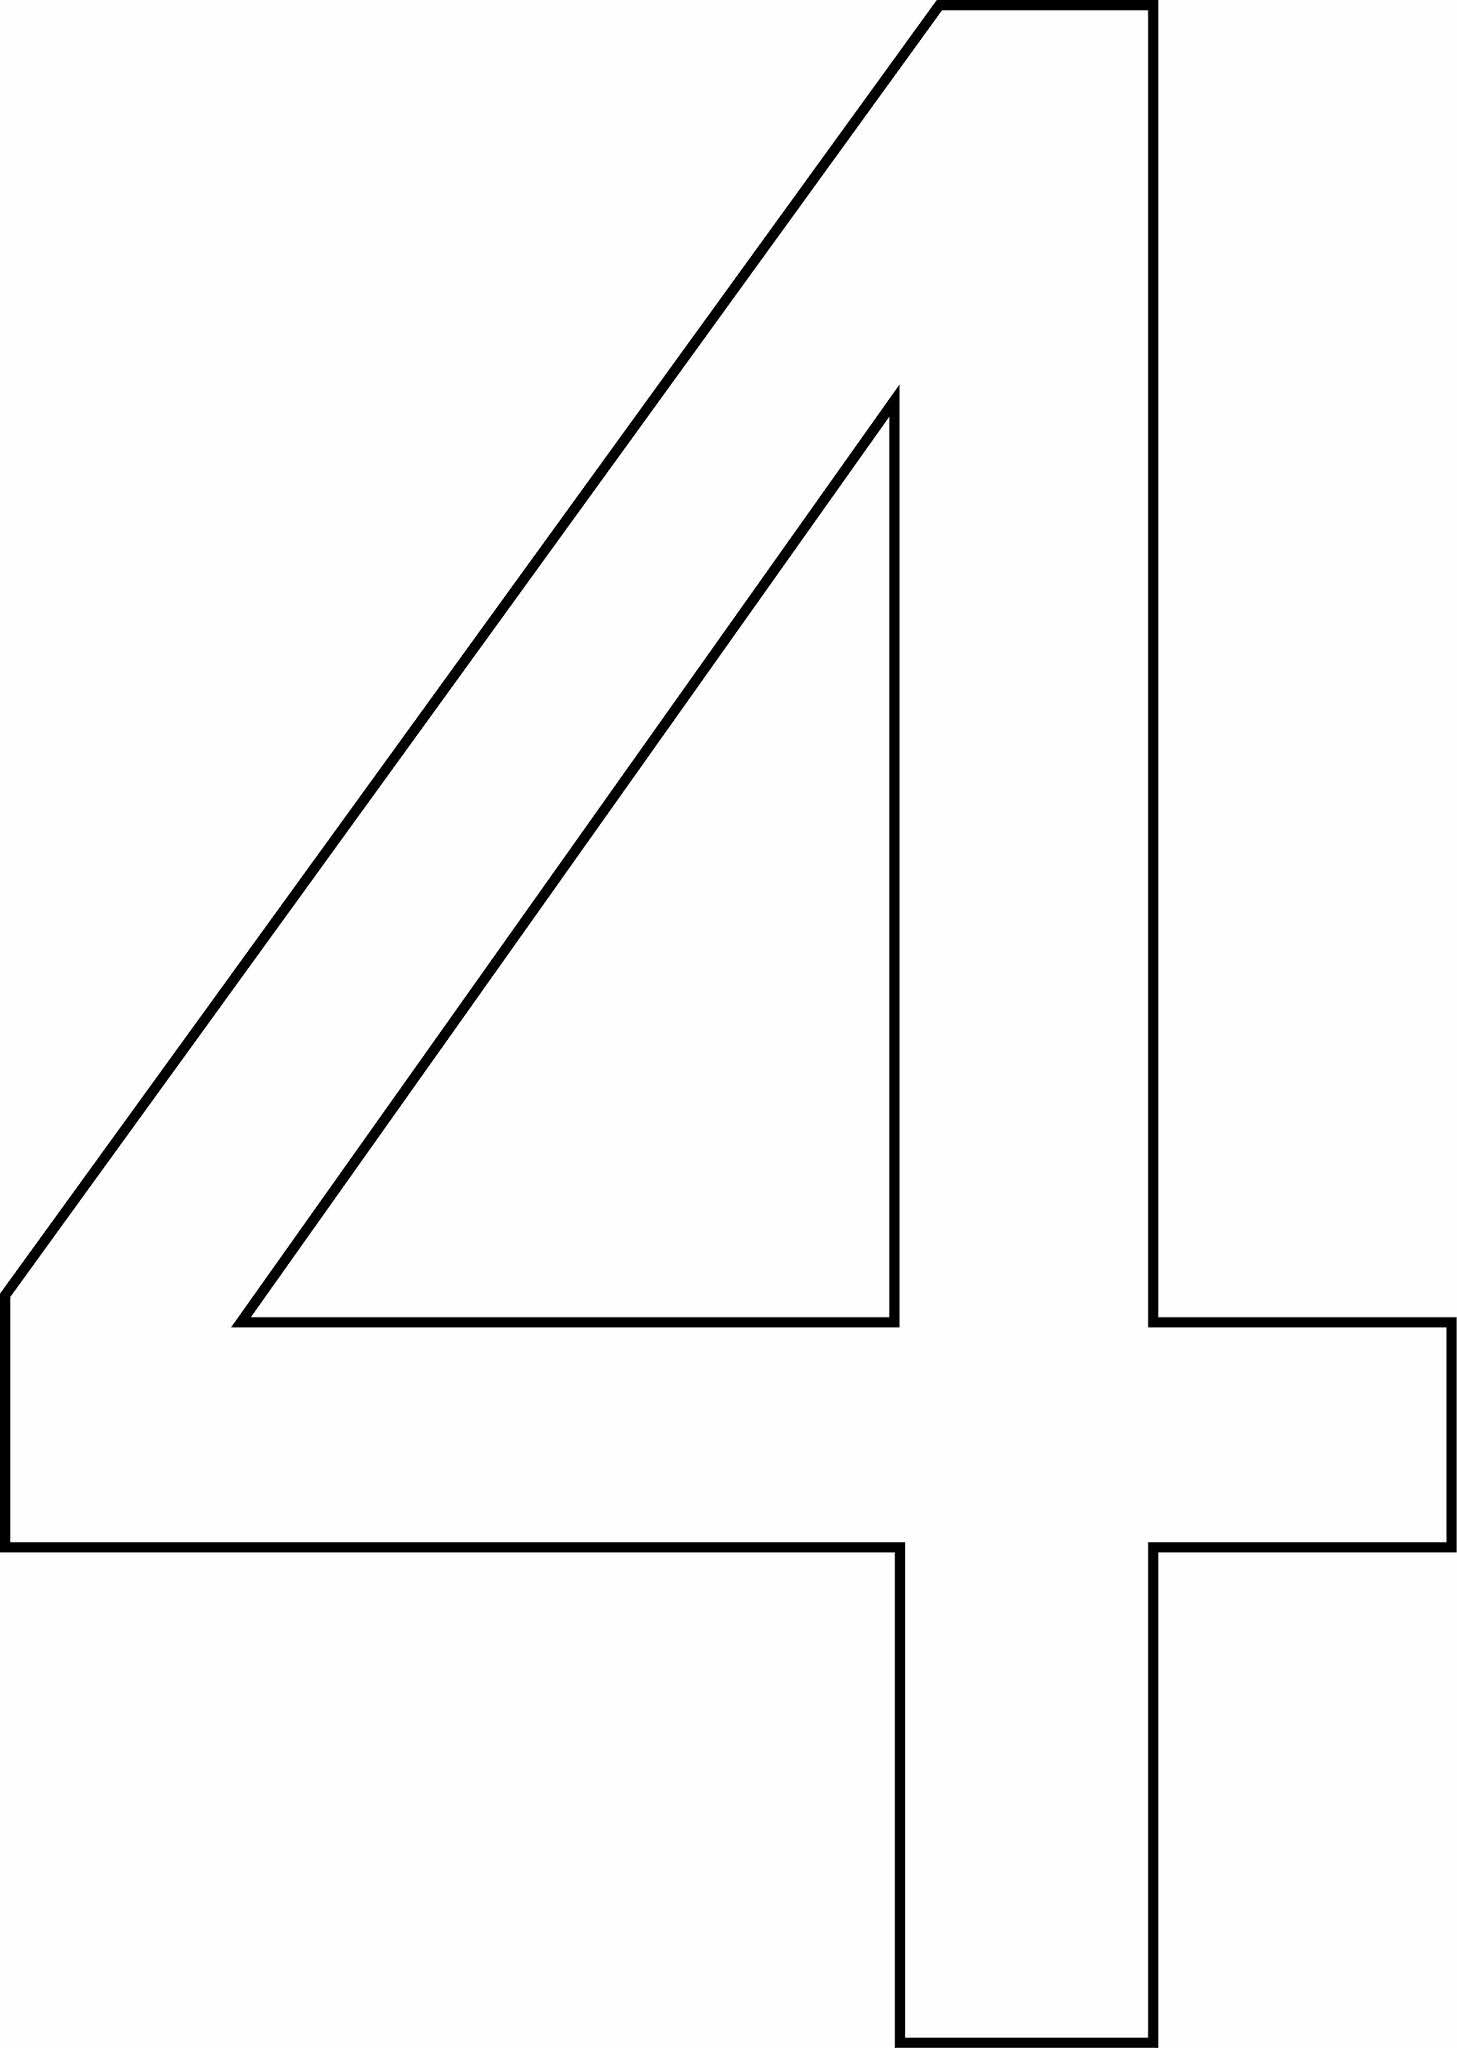 Número 4 (quatro) para imprimir